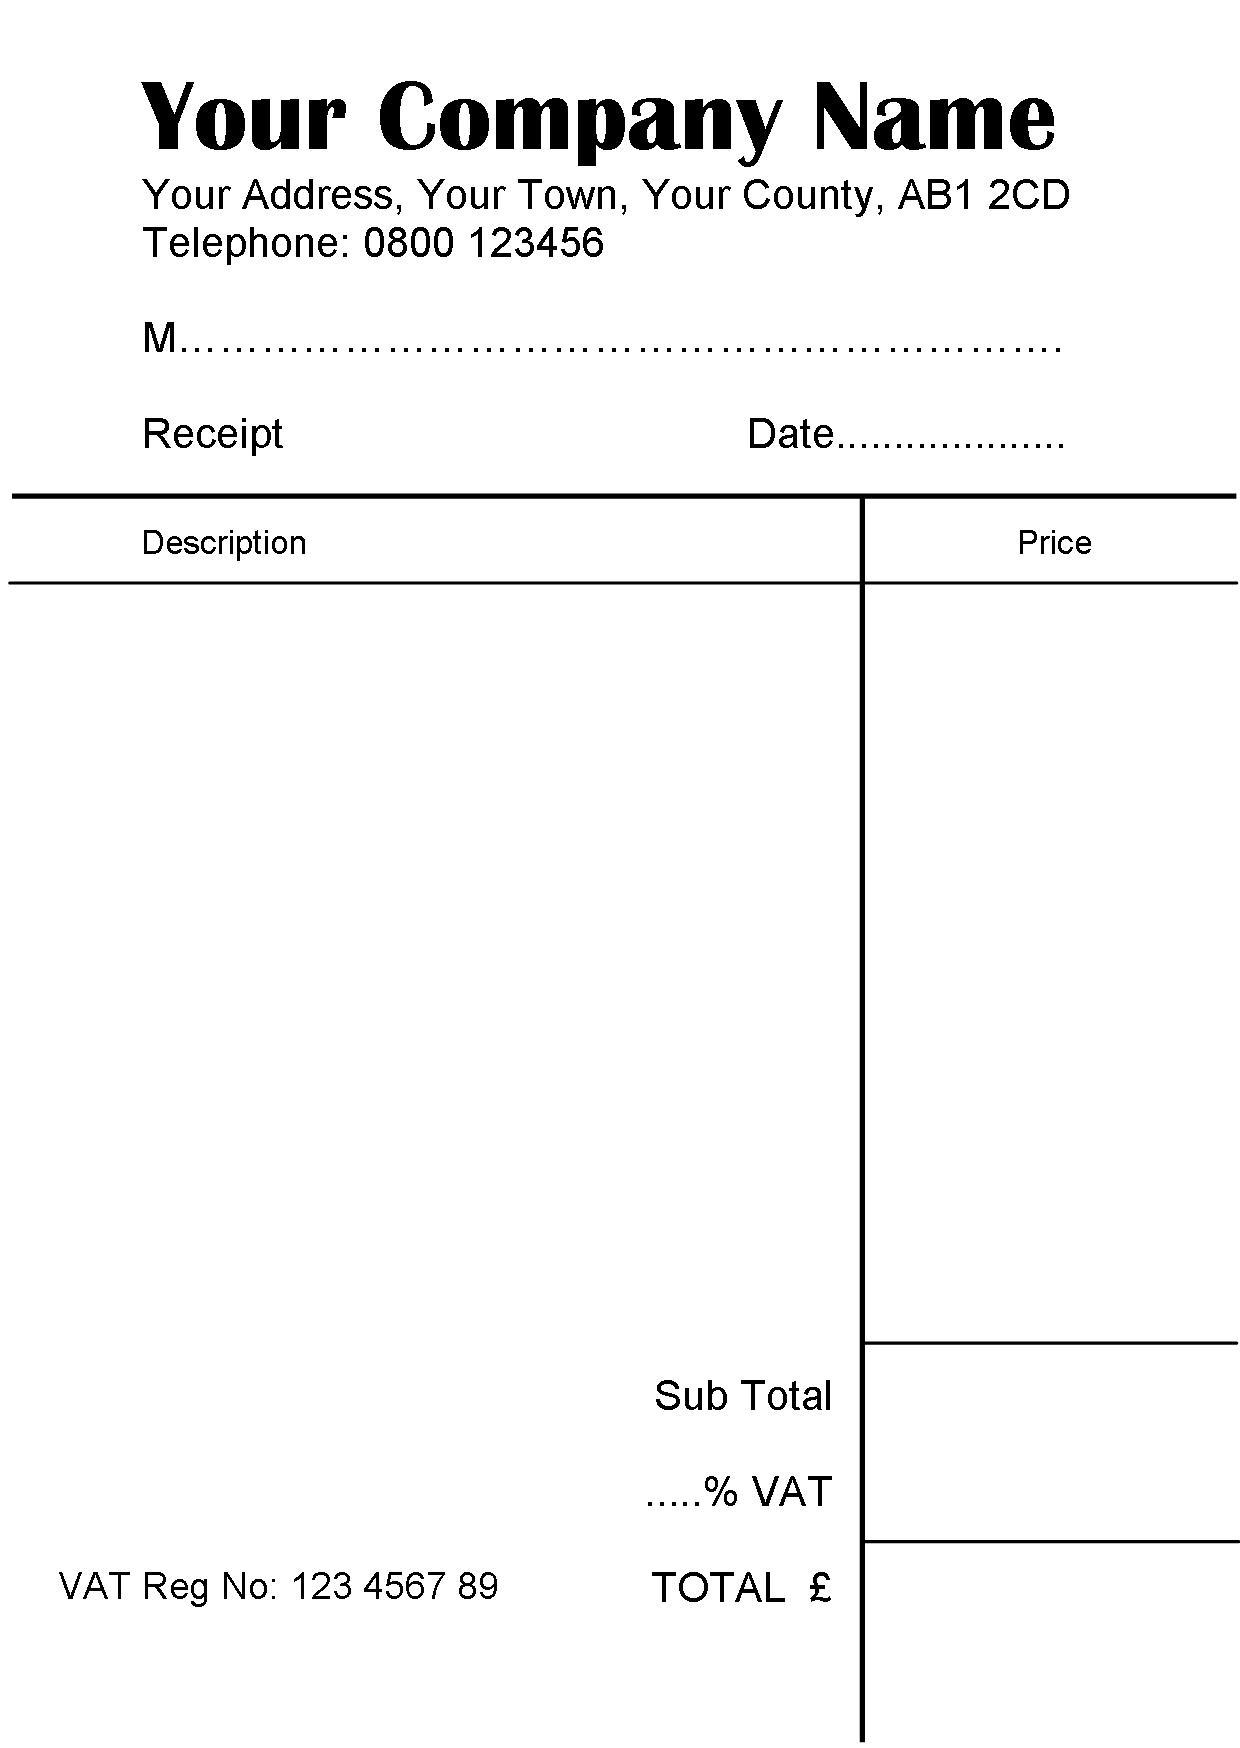 4 x 100 sheet Personalised Receipt Pads - Free Design | eBay